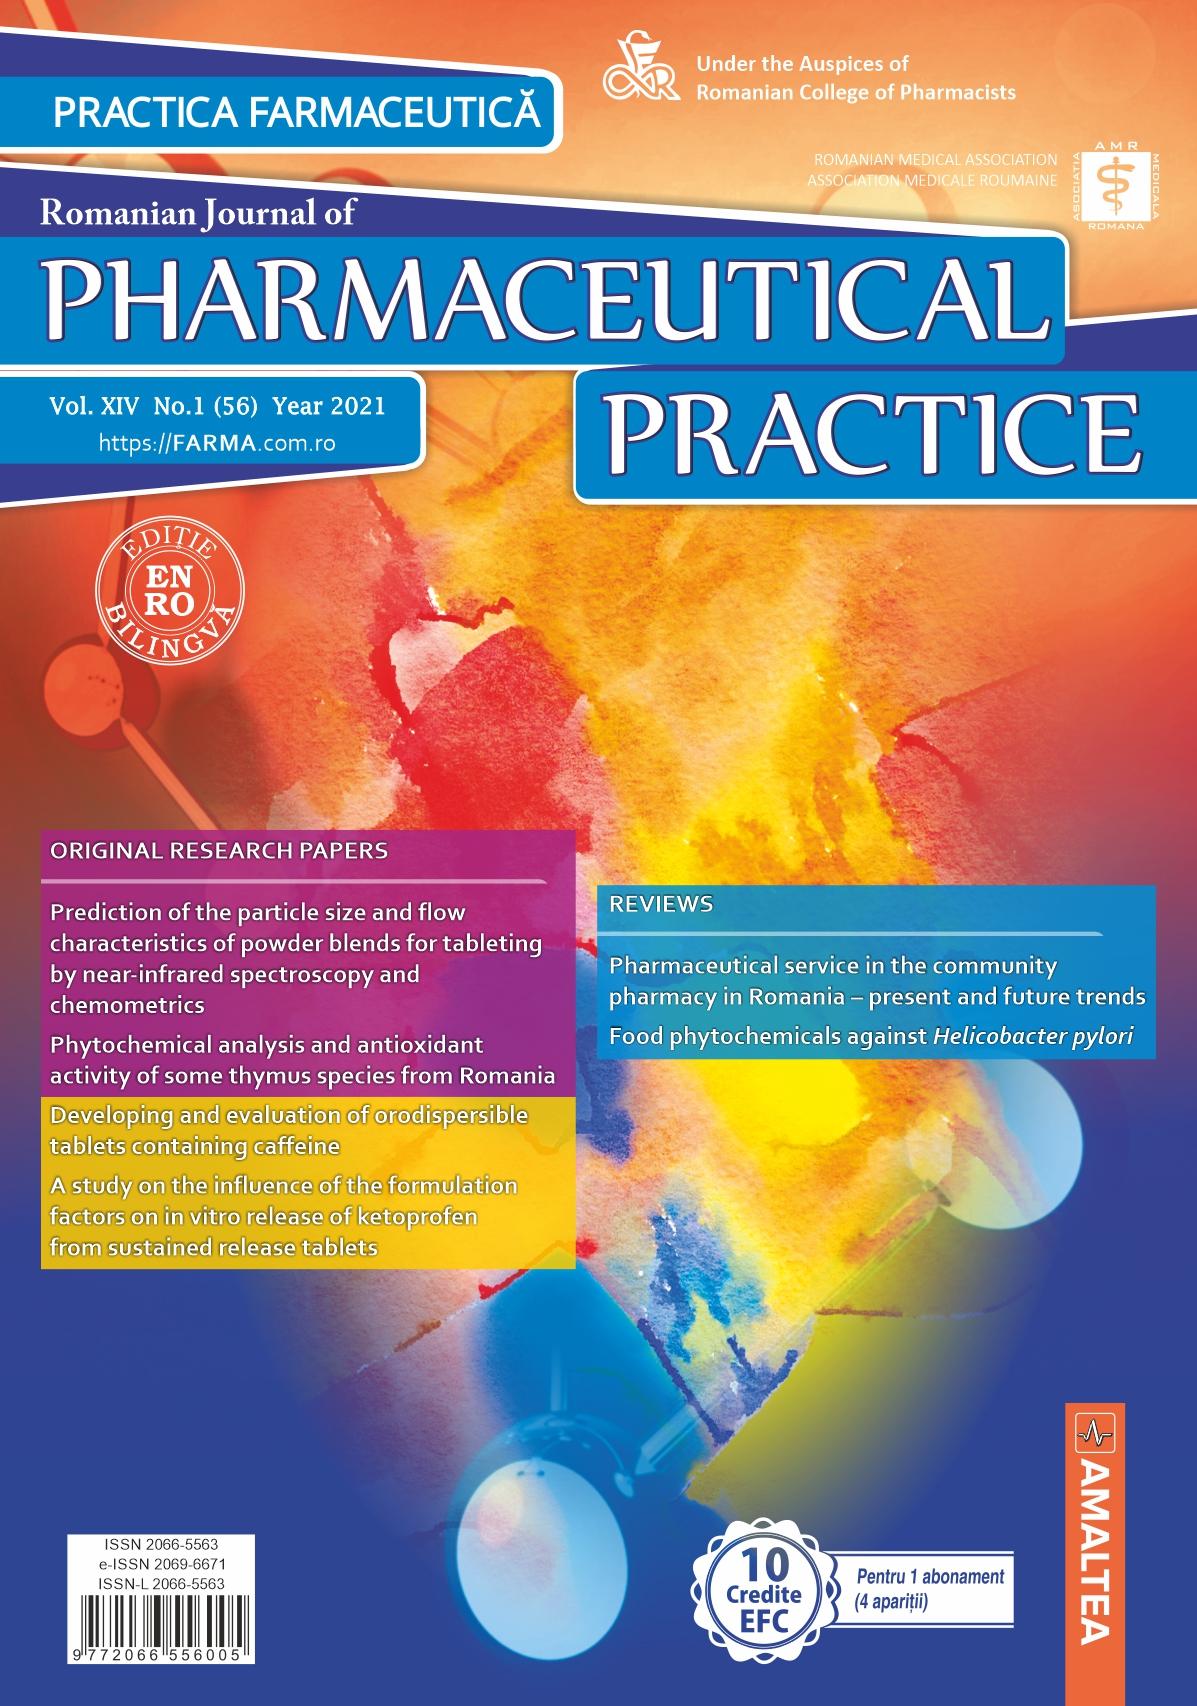 Romanian Journal of Pharmaceutical Practice - Practica Farmaceutica, Vol. XIV, No. 1 (56), 2021